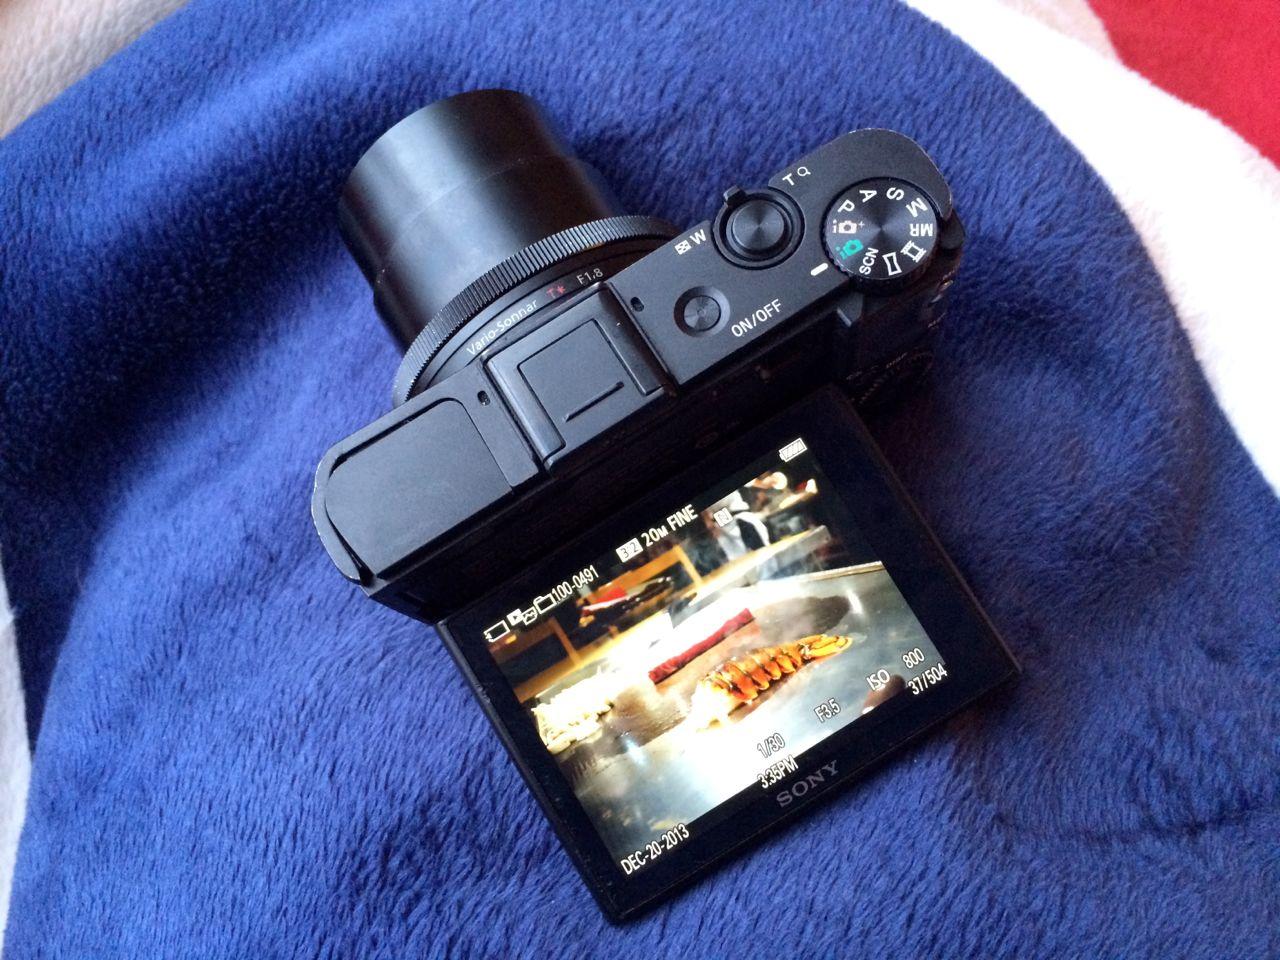 Sony RX100 II Review (Camera Secrets!) - The Londoner